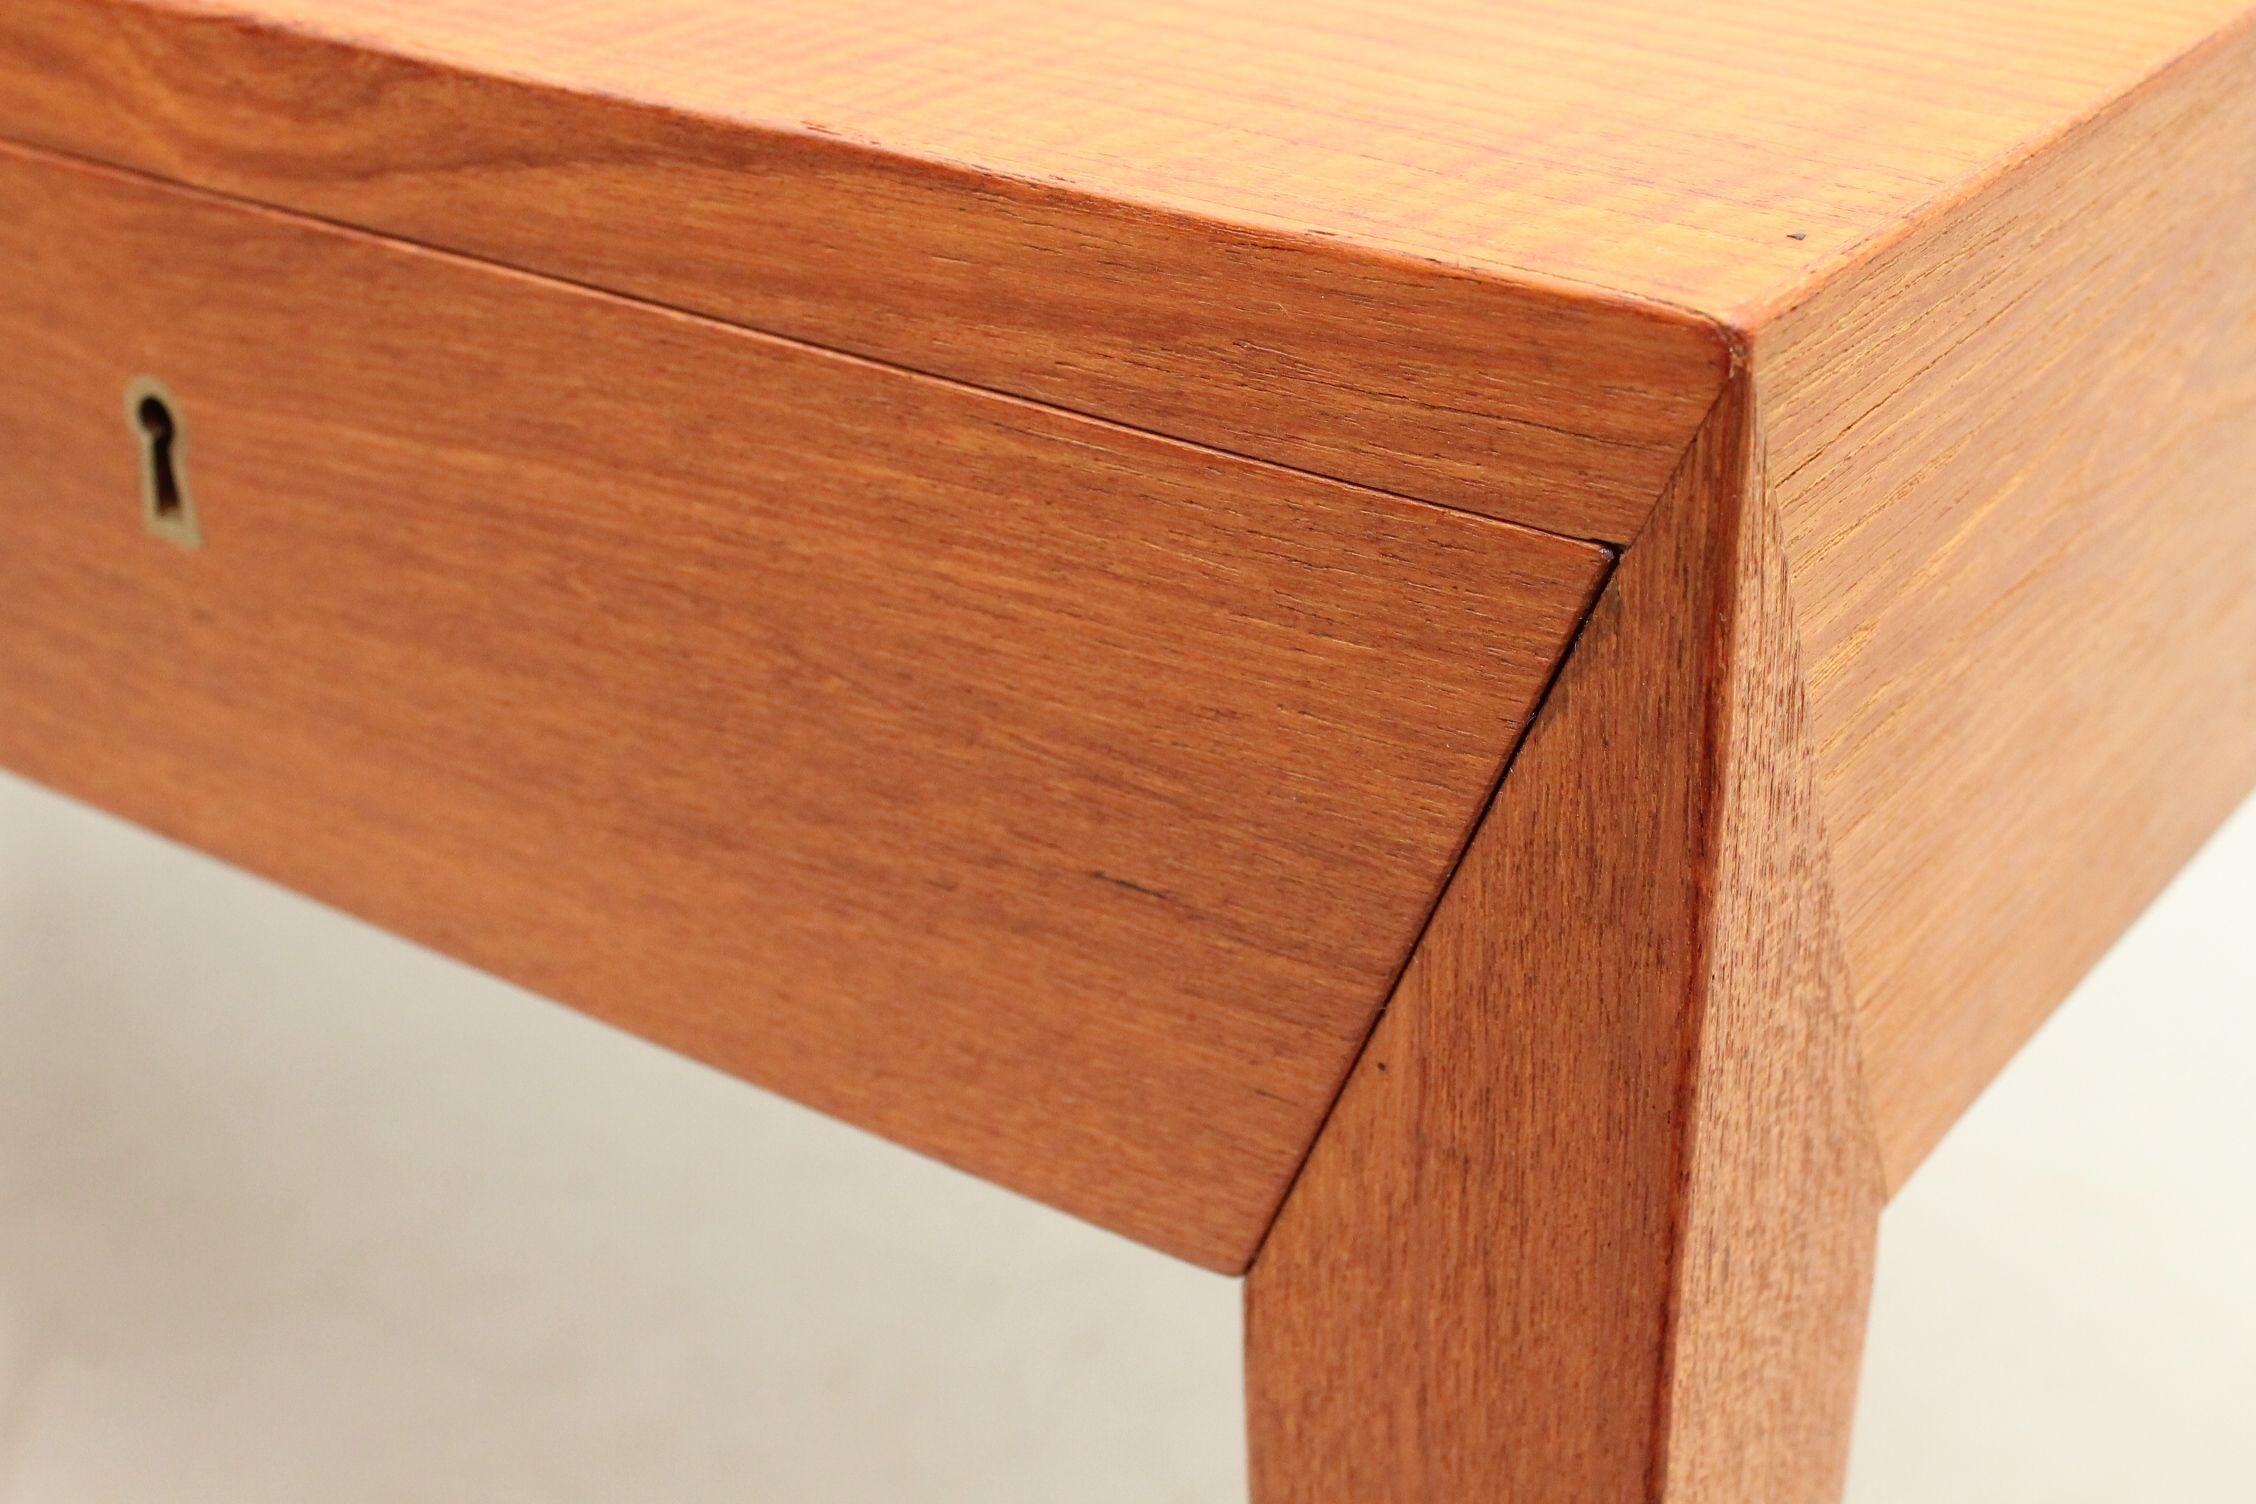 Detail from a super minimalist desk in teak designed by Severin Hansen Jr. and manufactured by Haslev Møbelsnedkeri, Denmark. www.reModern.dk